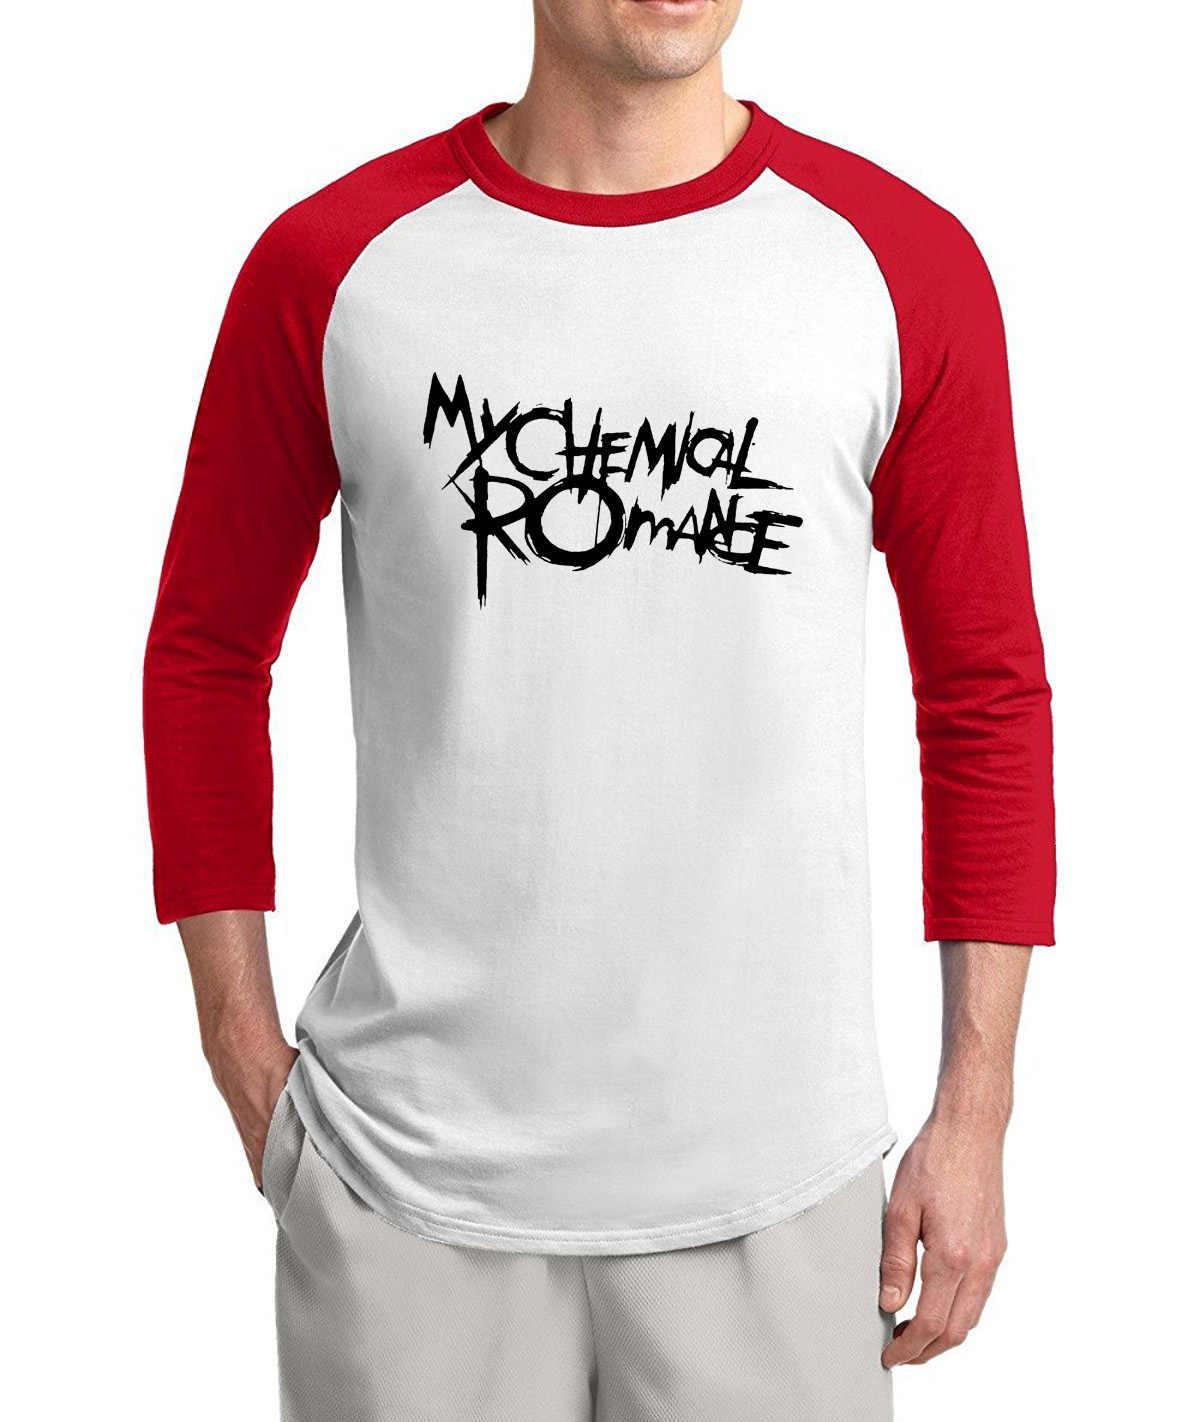 Rock Band Music shirt men 2019 summer 100% cotton 3/4 sleeve raglan men t-shirt hip hop style o-neck top tees